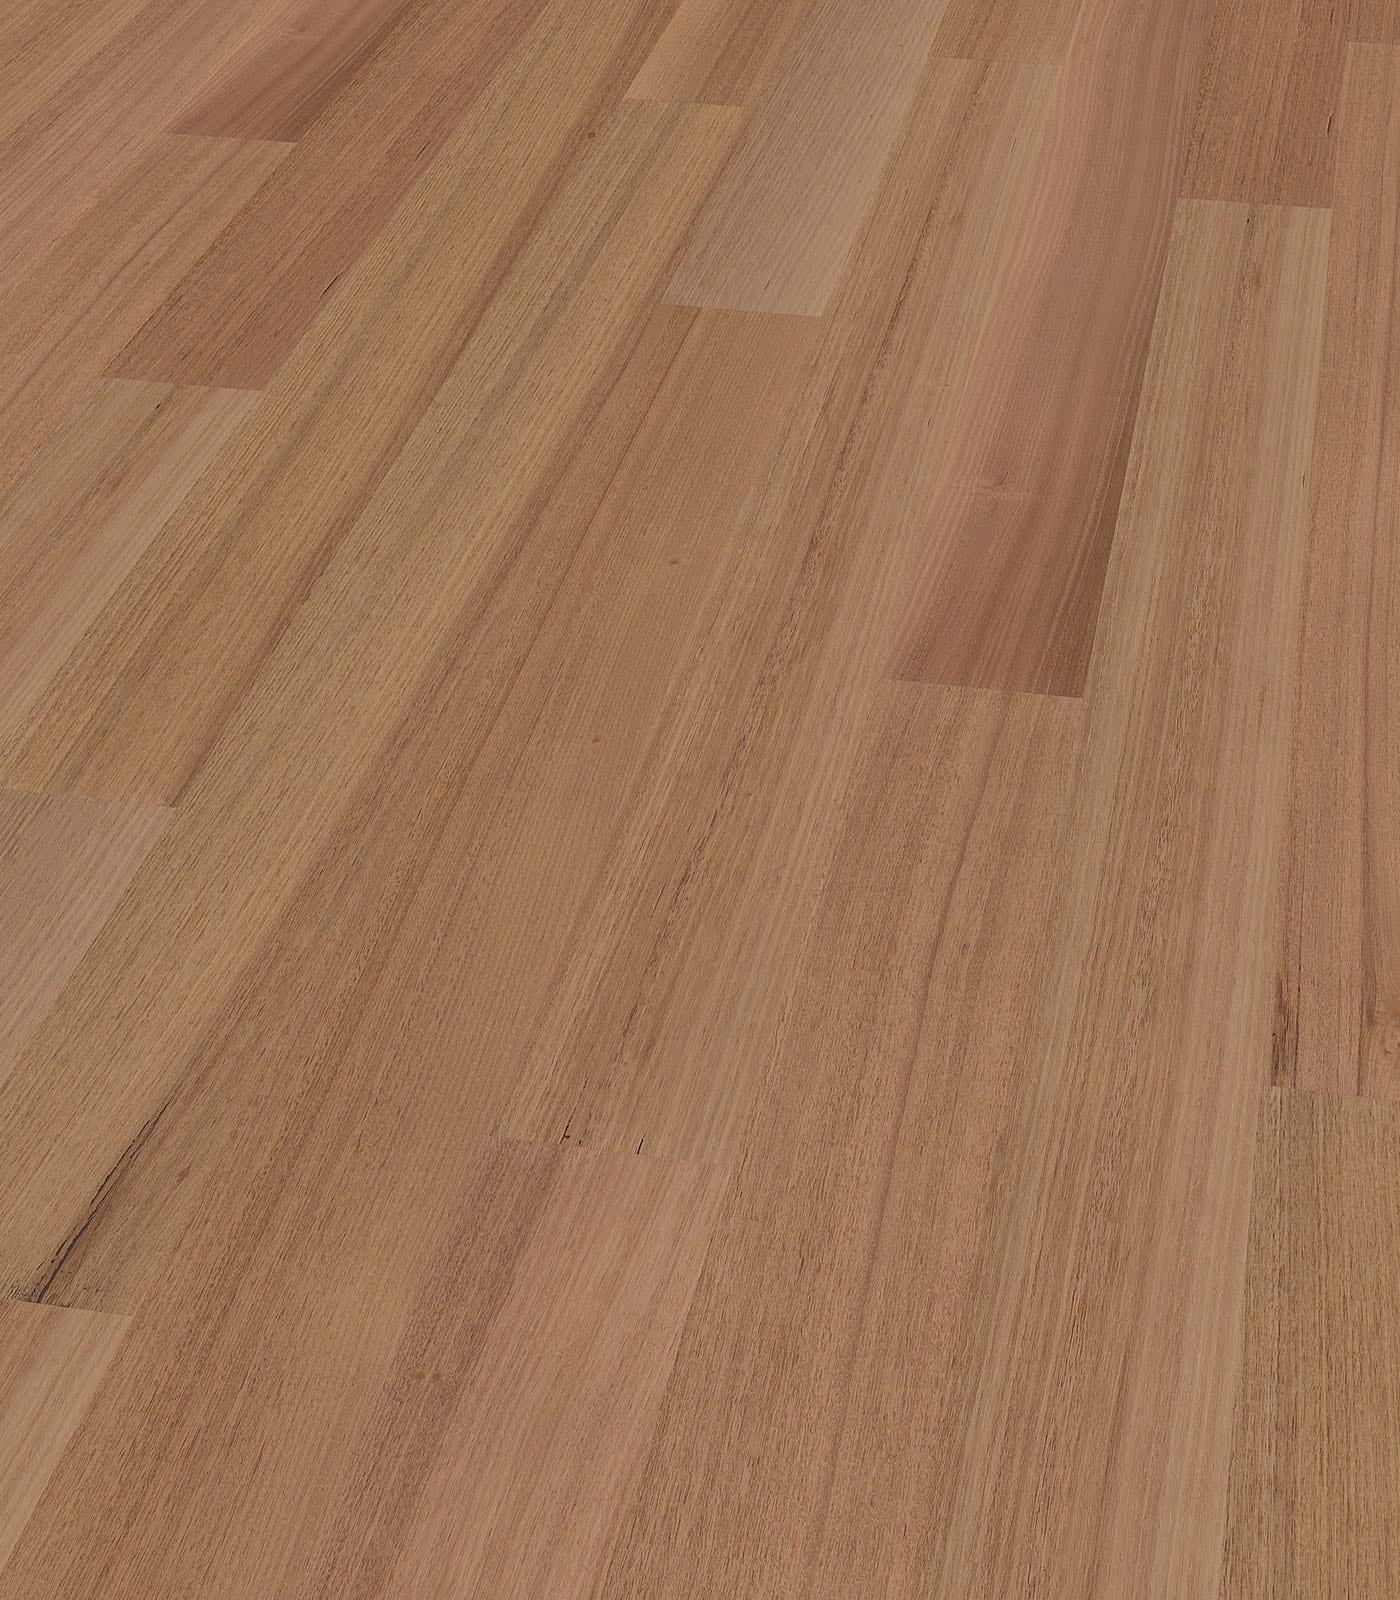 Melbourne-After Oak Collection-Tasmanian Oak Floors-angle